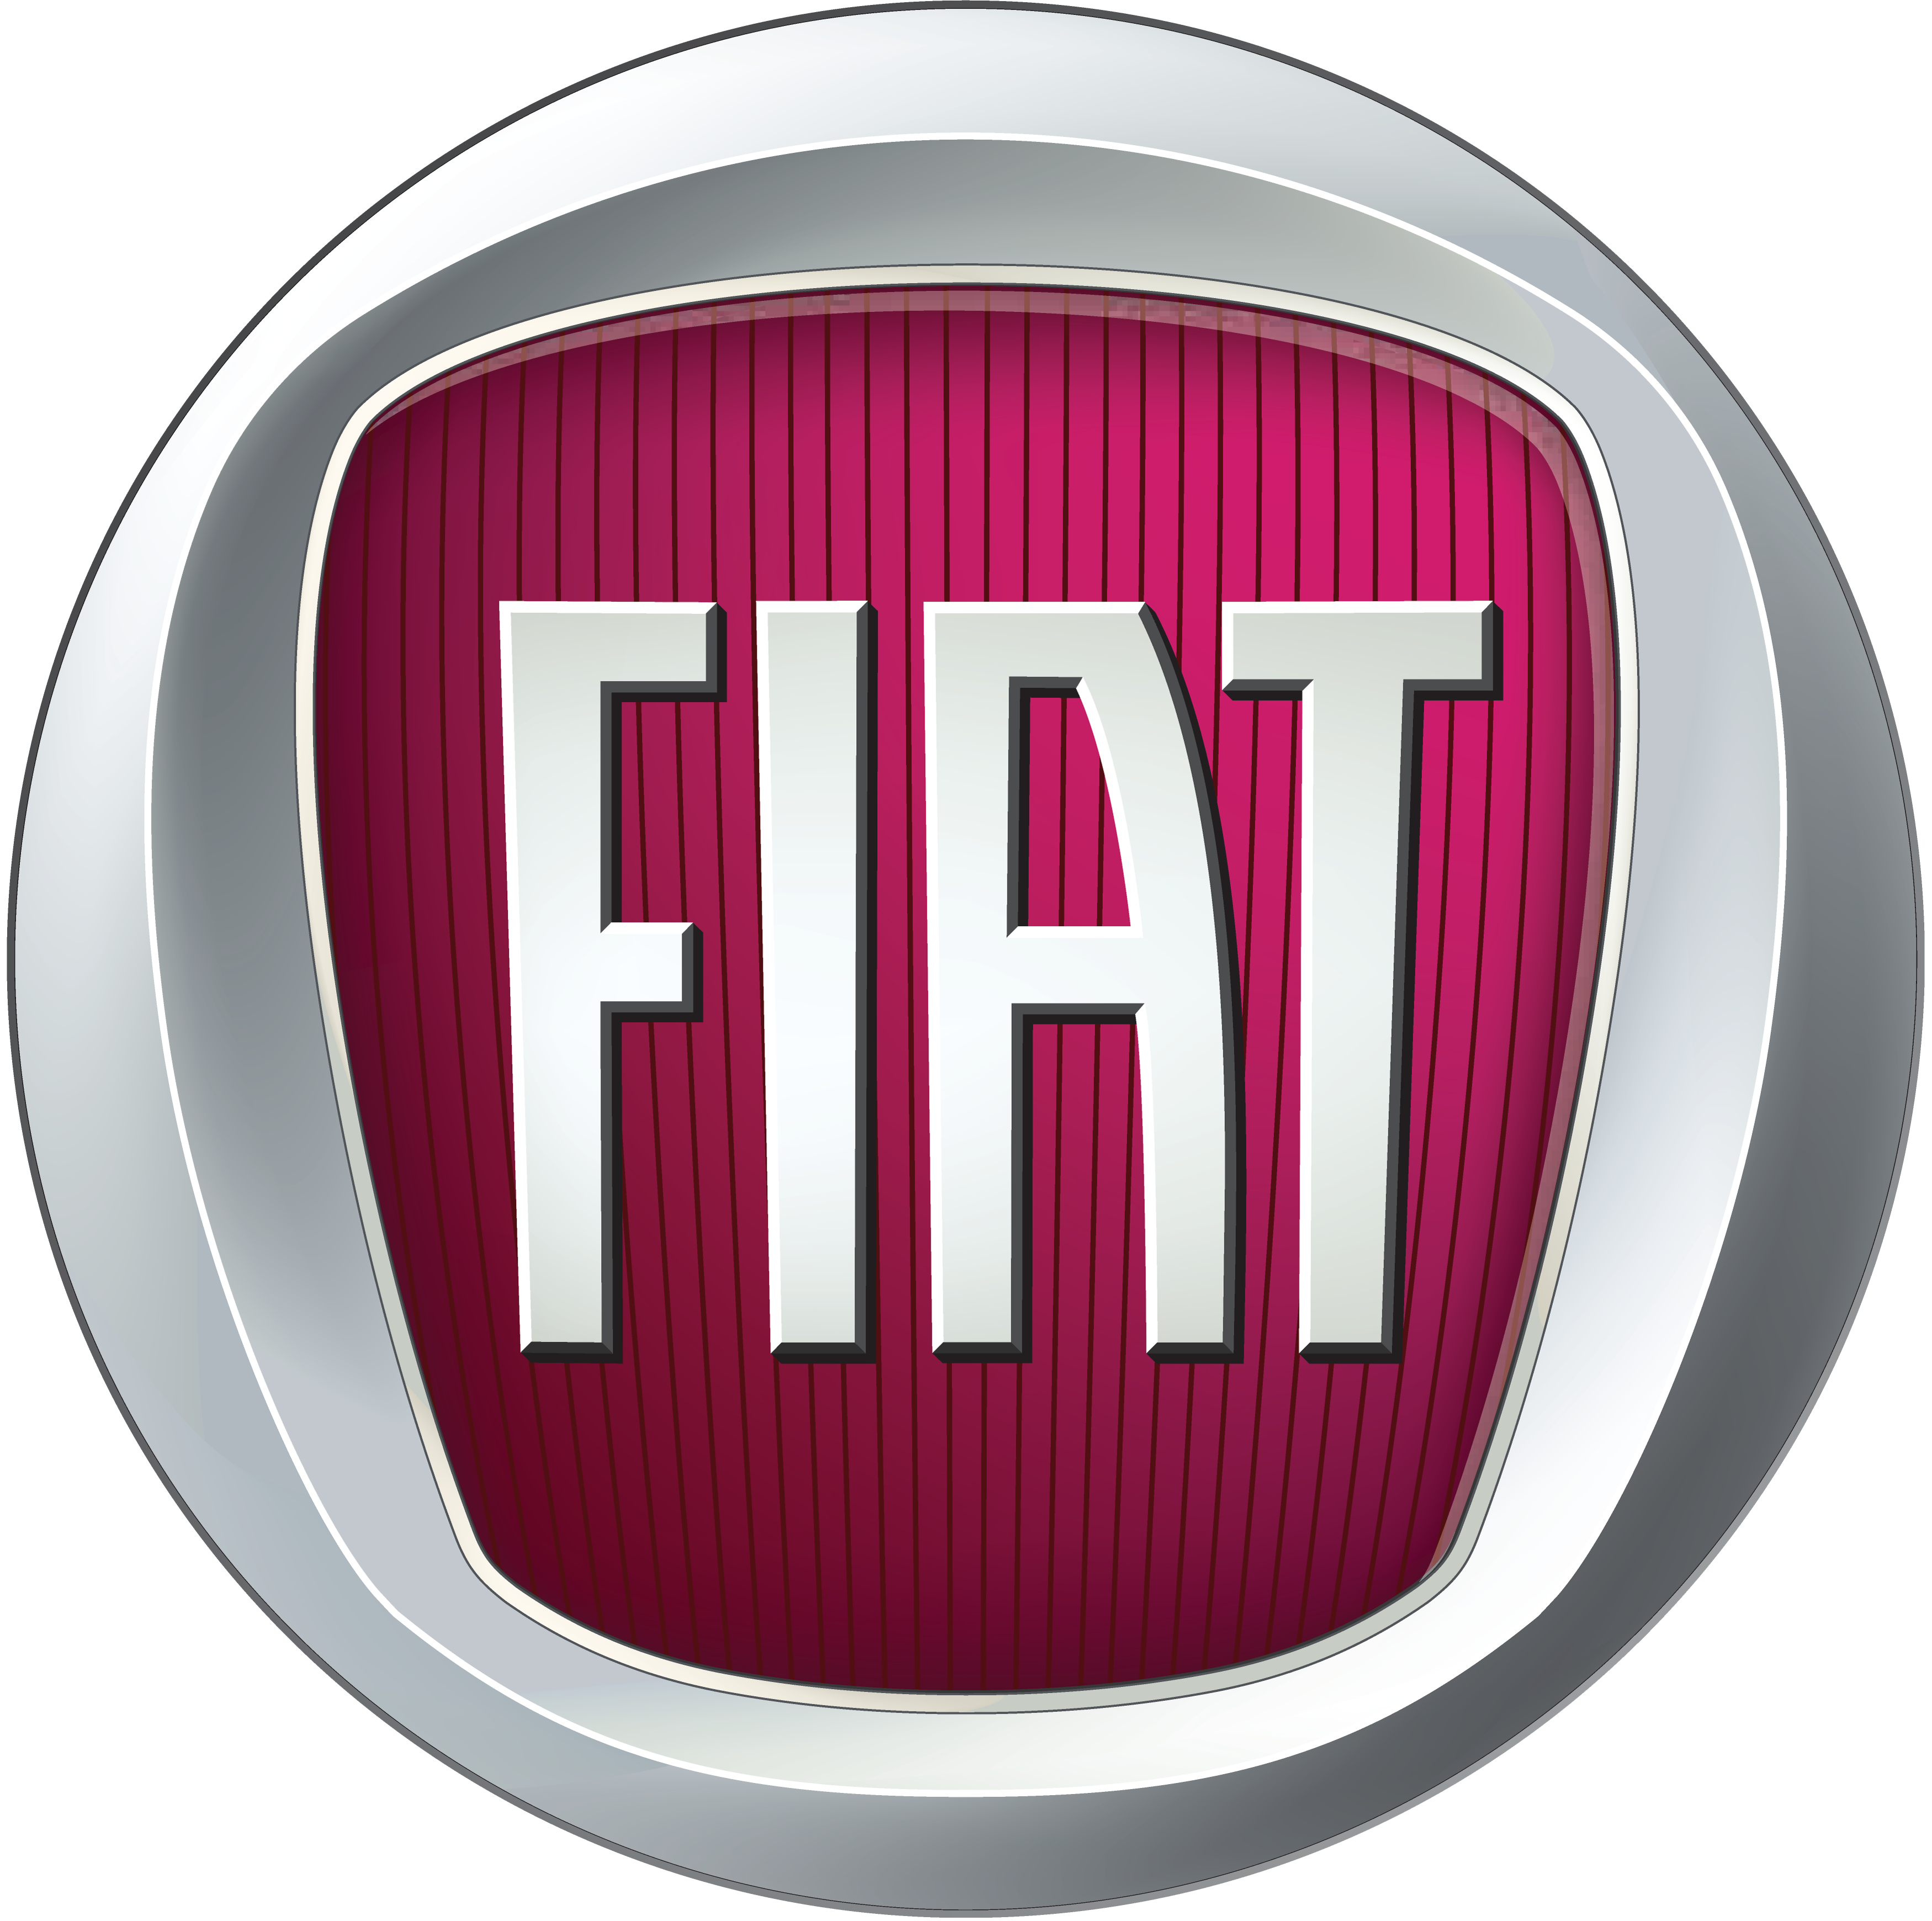 fiat logo 2 1 - FIAT Logo